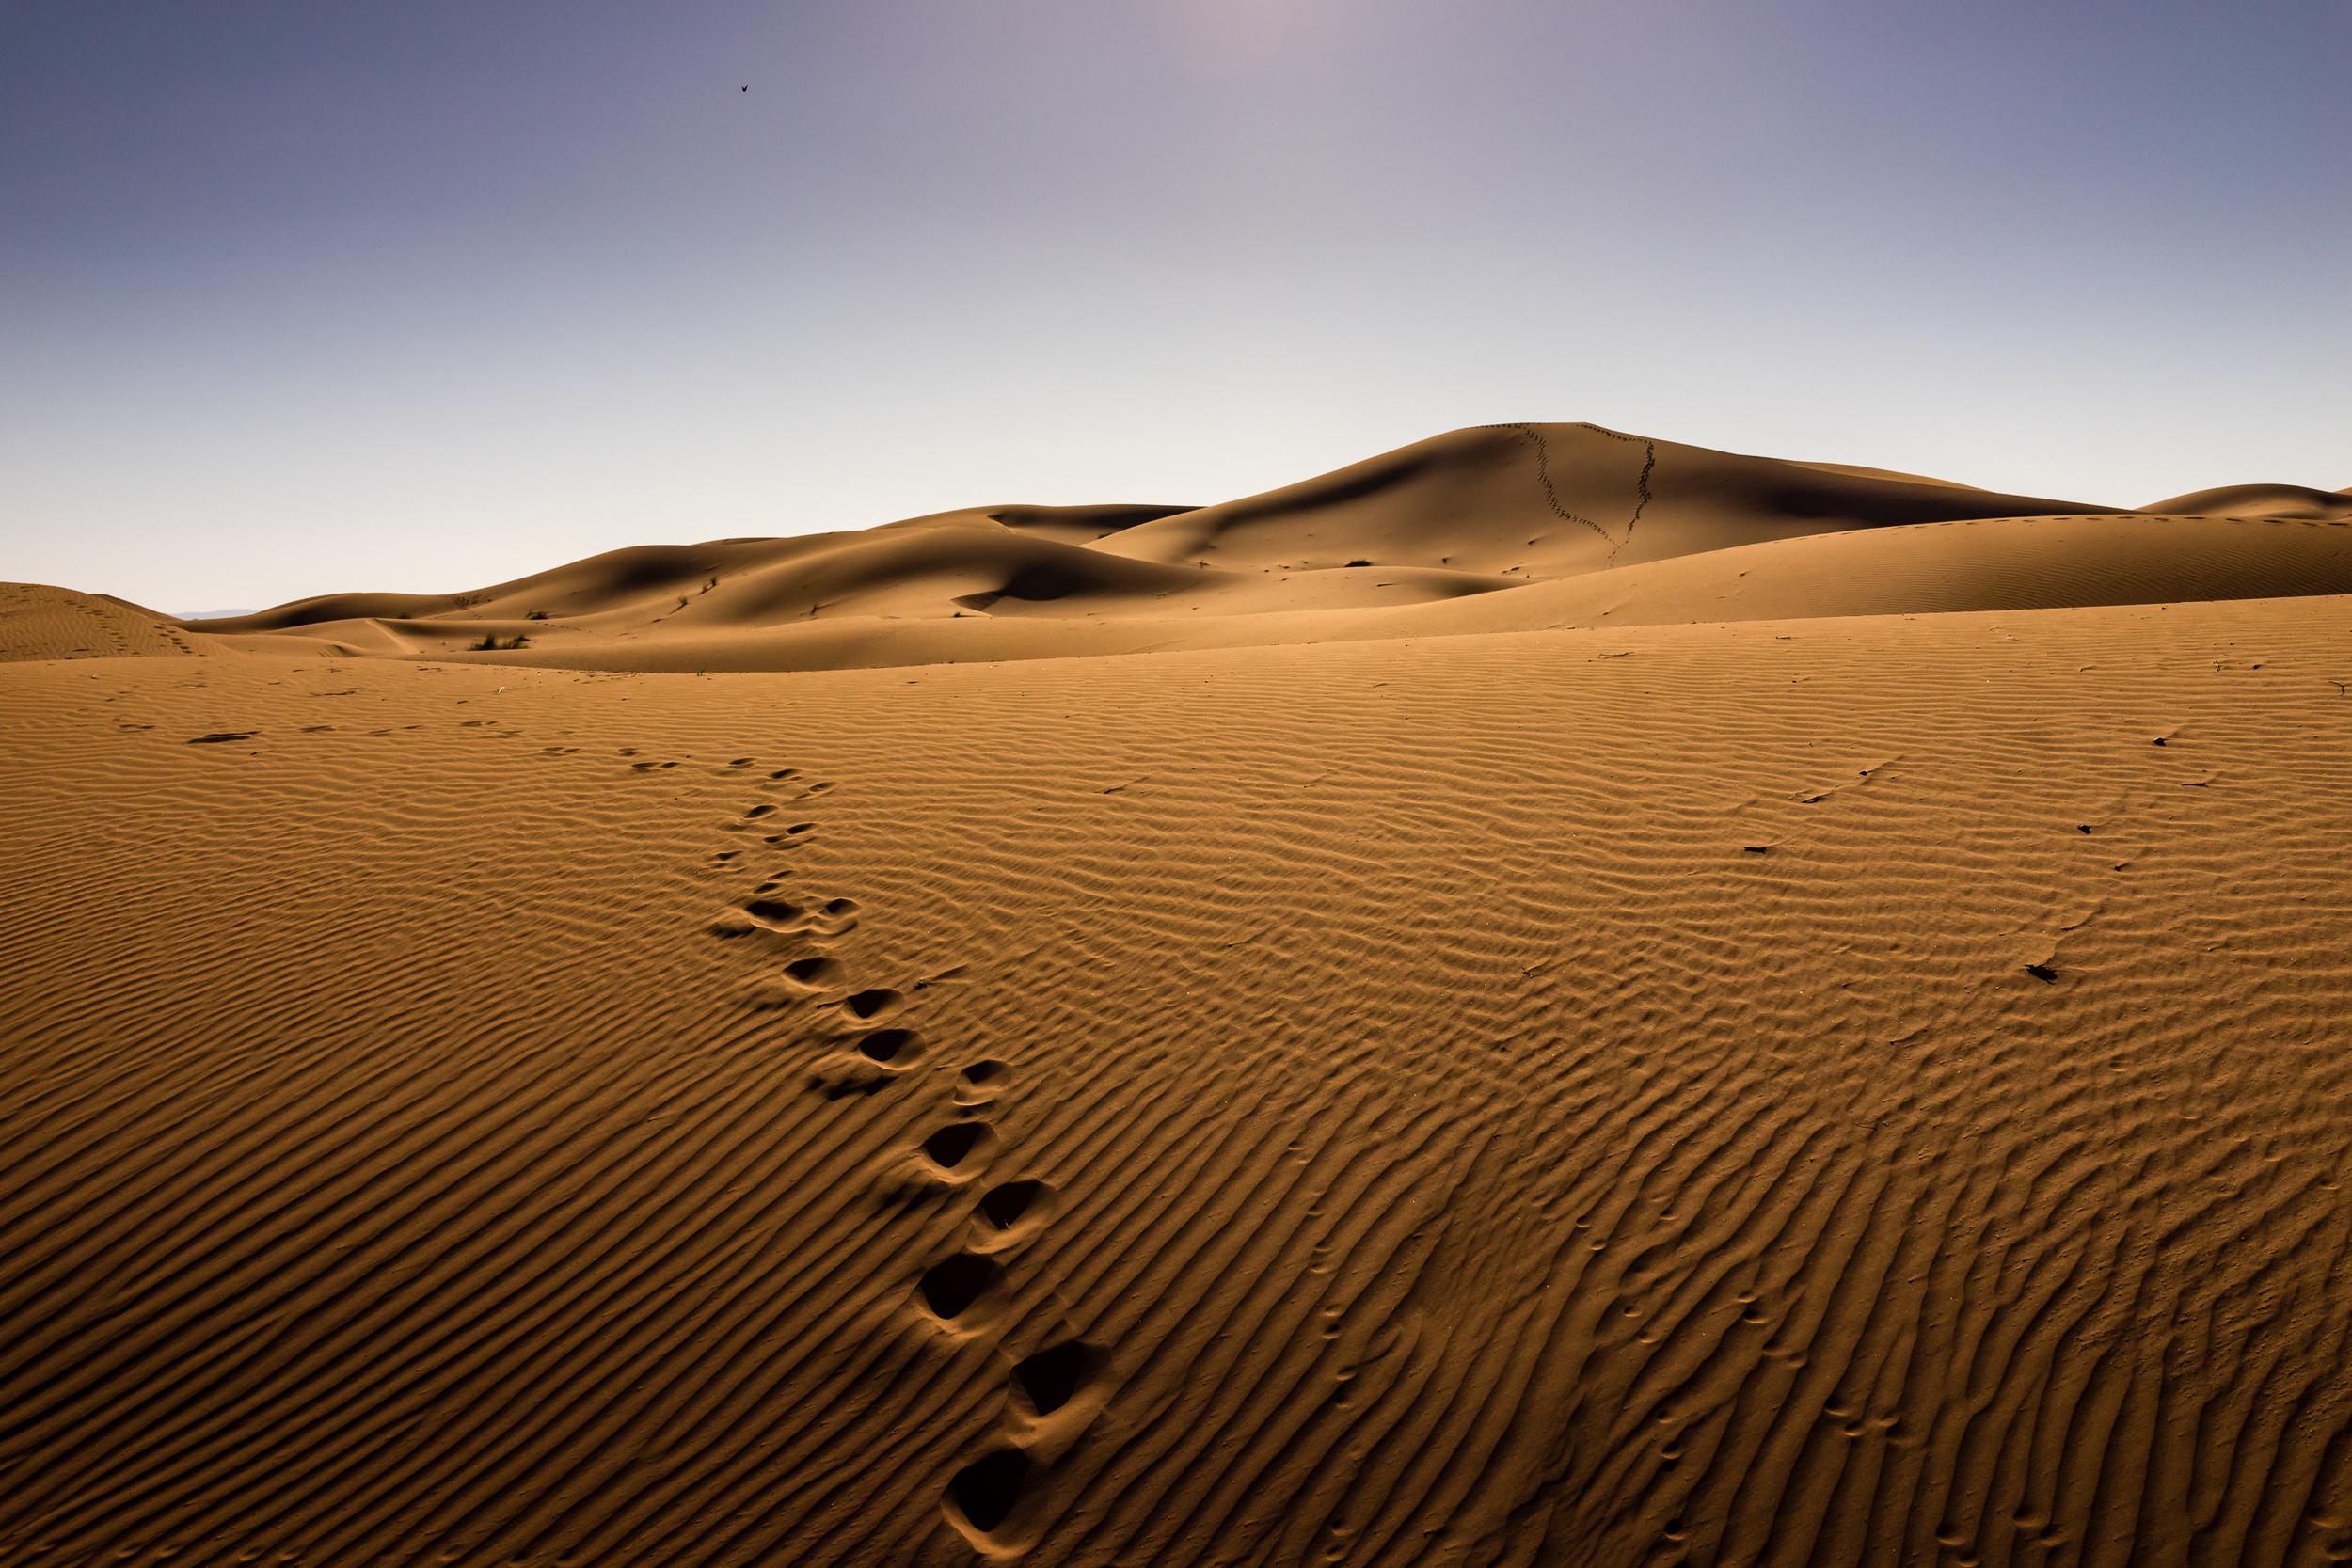 morocco by jb rasor-15.jpg